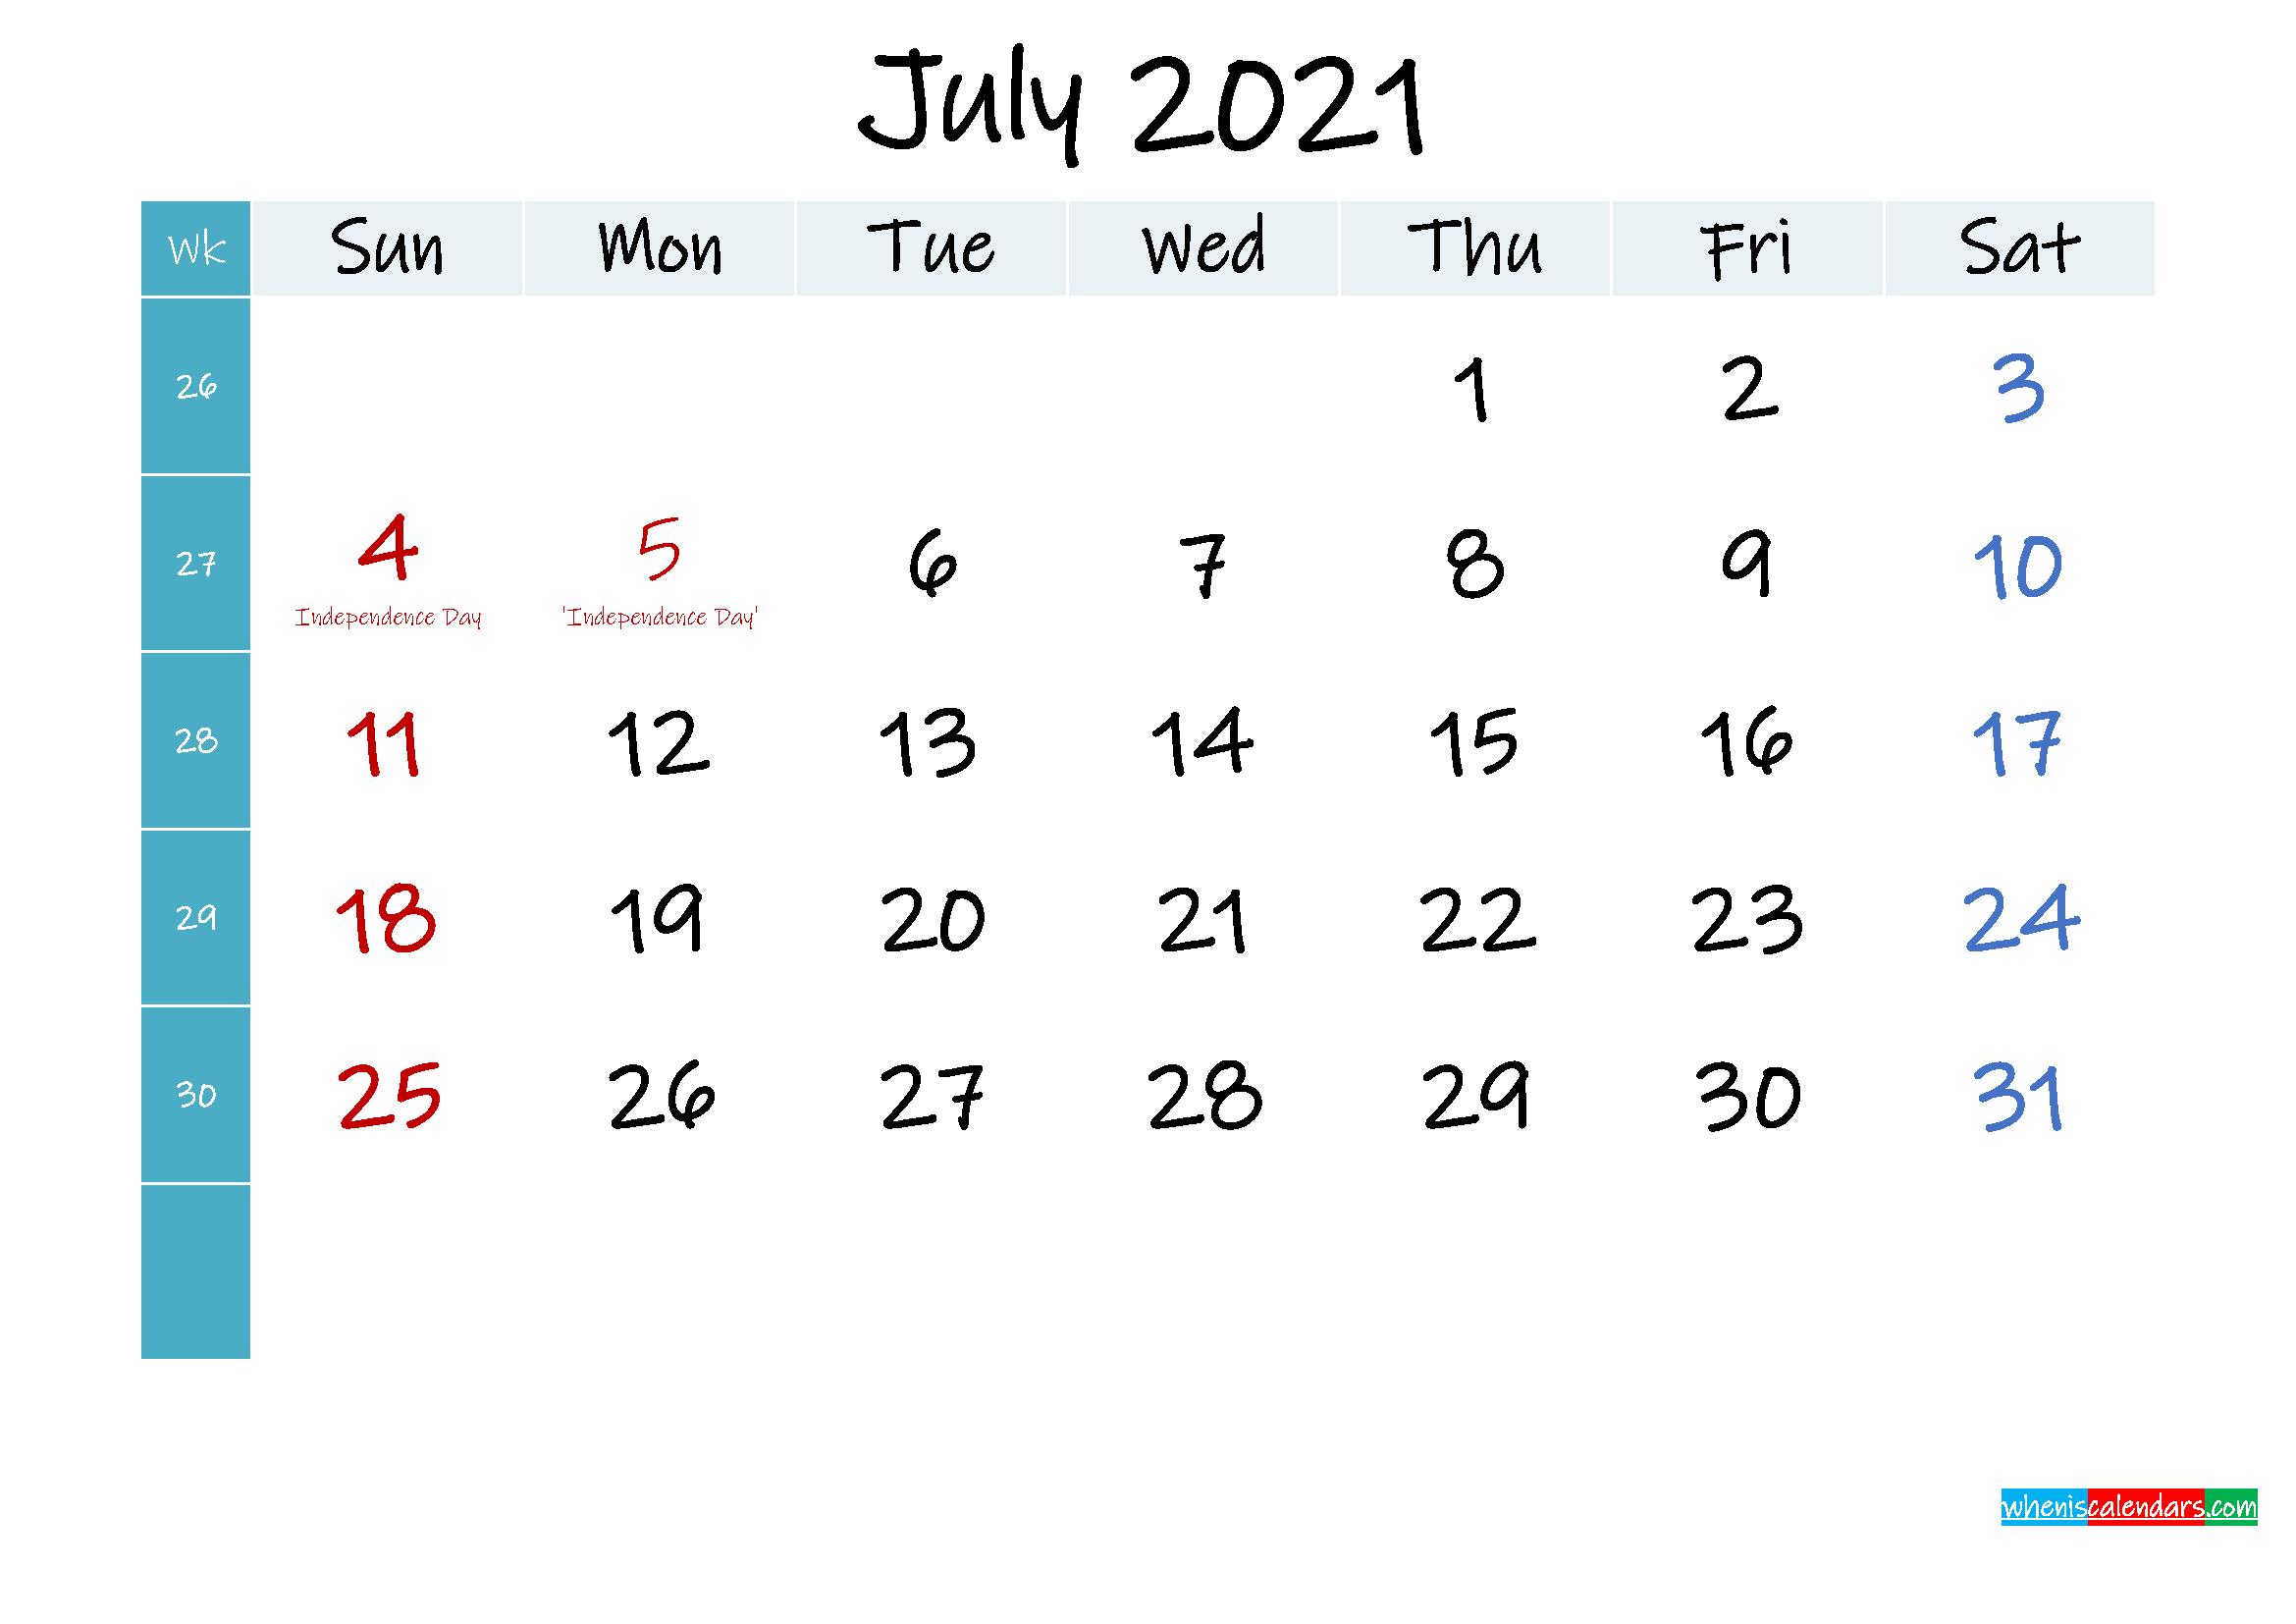 July 2021 Free Printable Calendar - Template No.ink21m403 ...